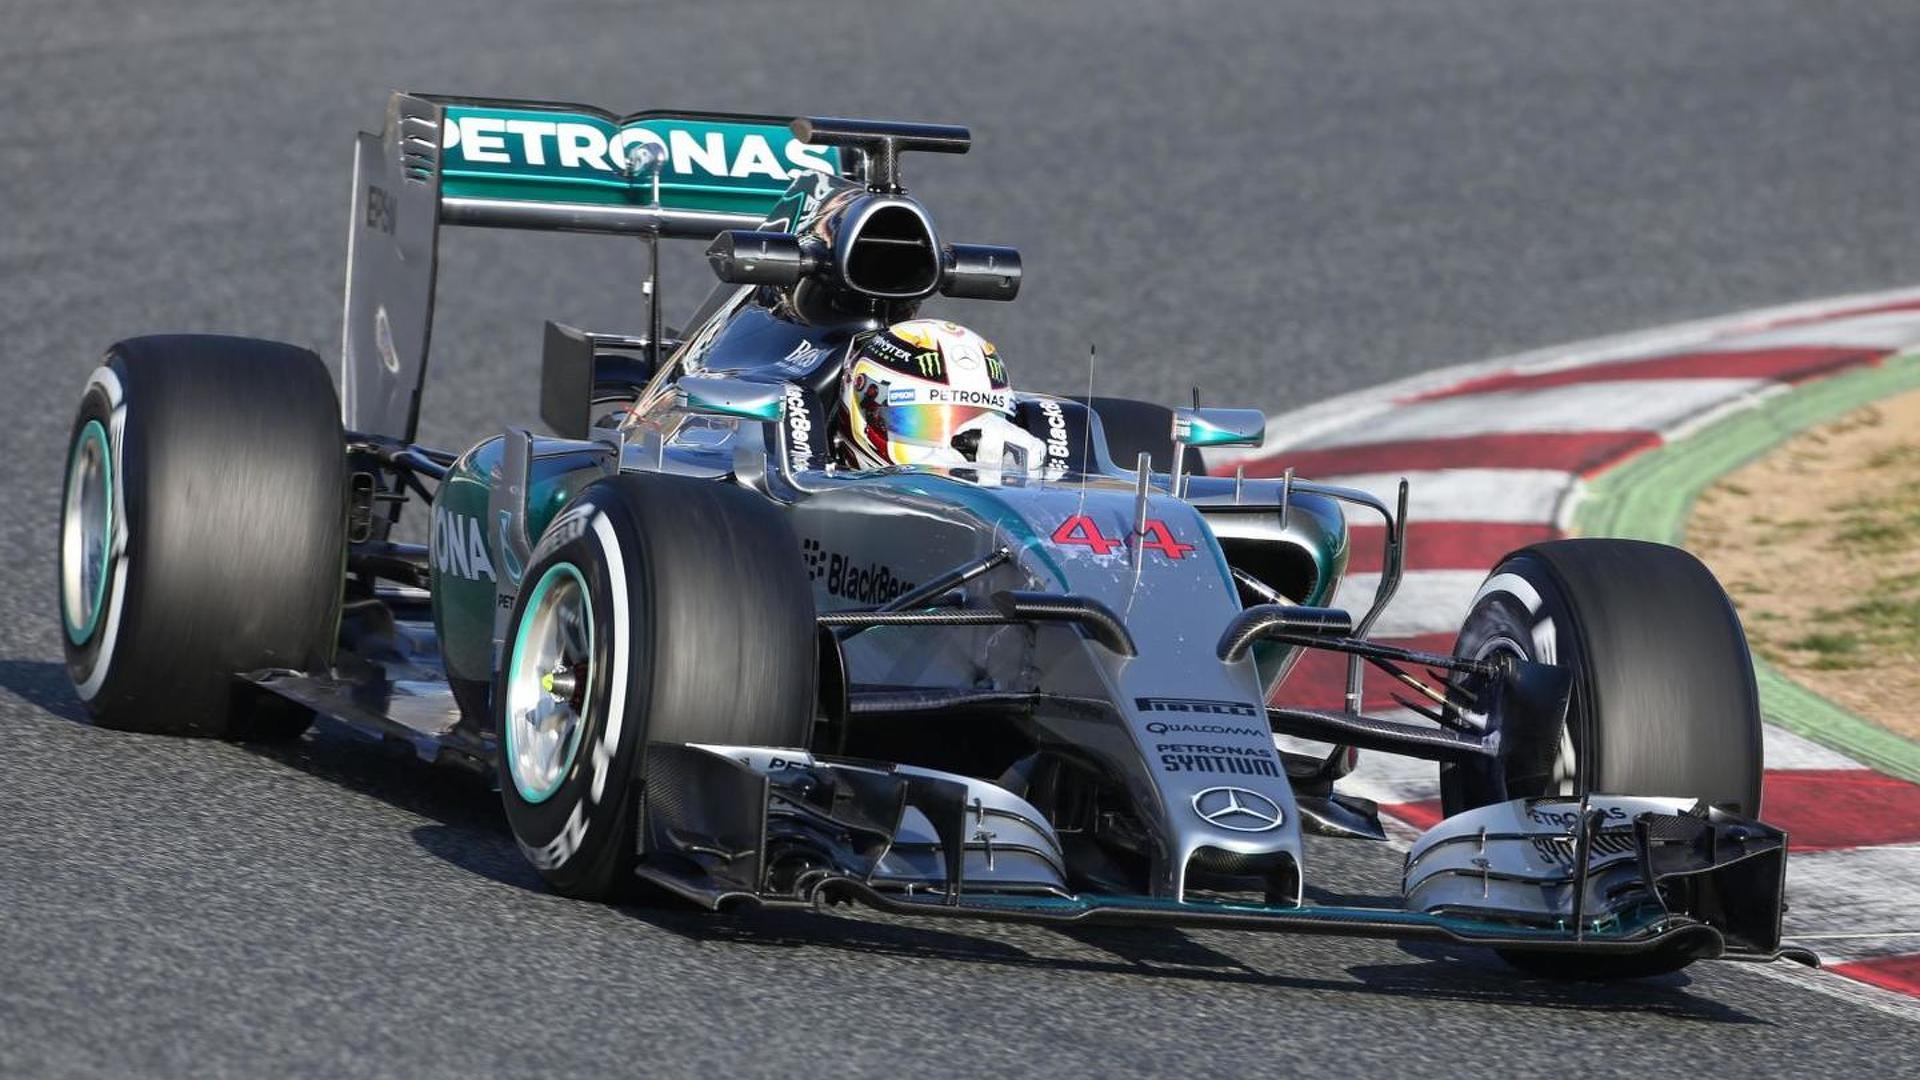 Hamilton unwell as Barcelona test begins